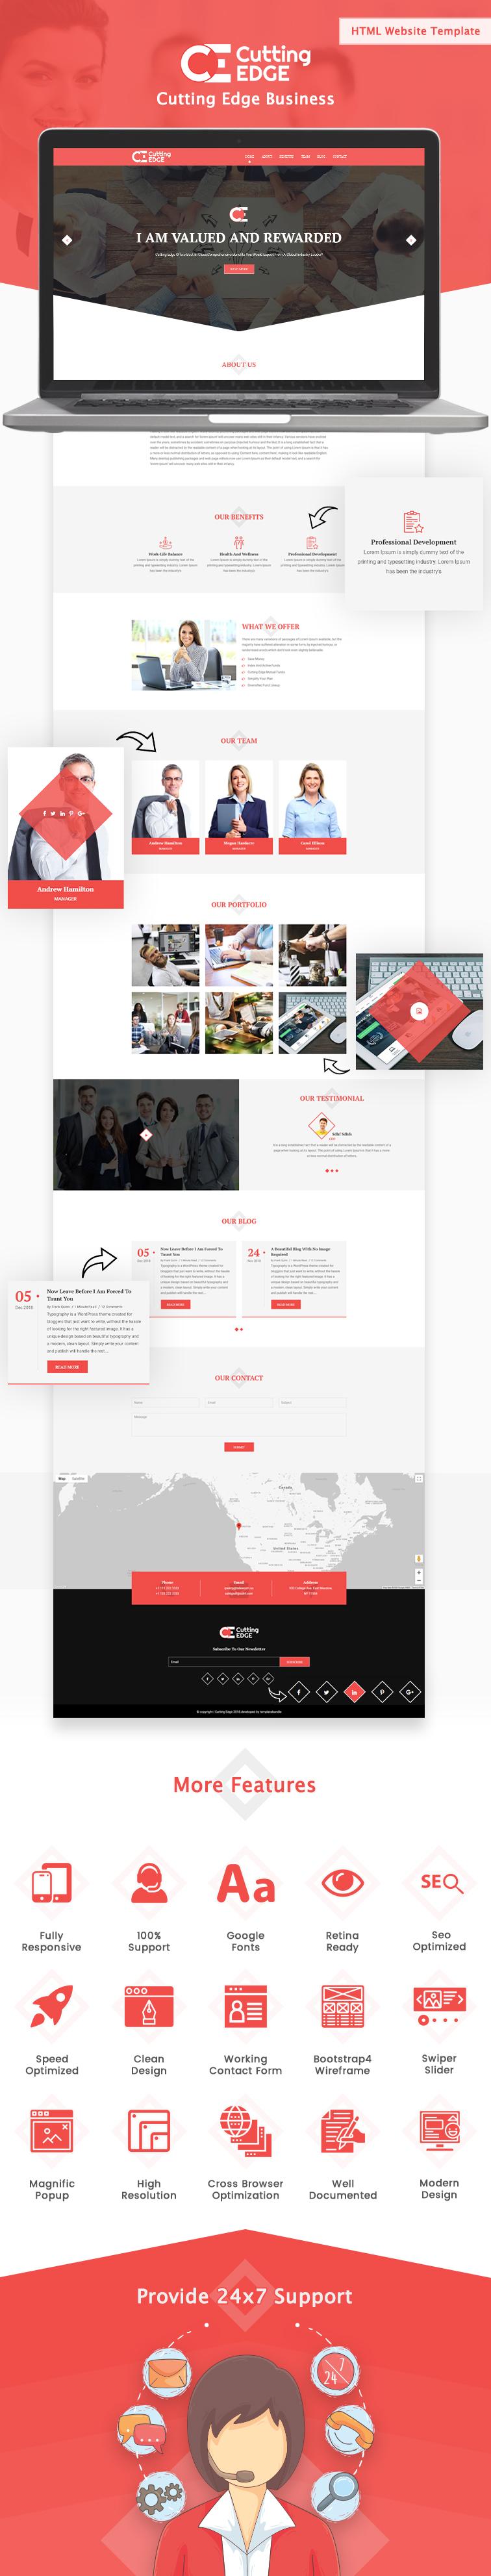 Cutting Edge Business HTML Website Template